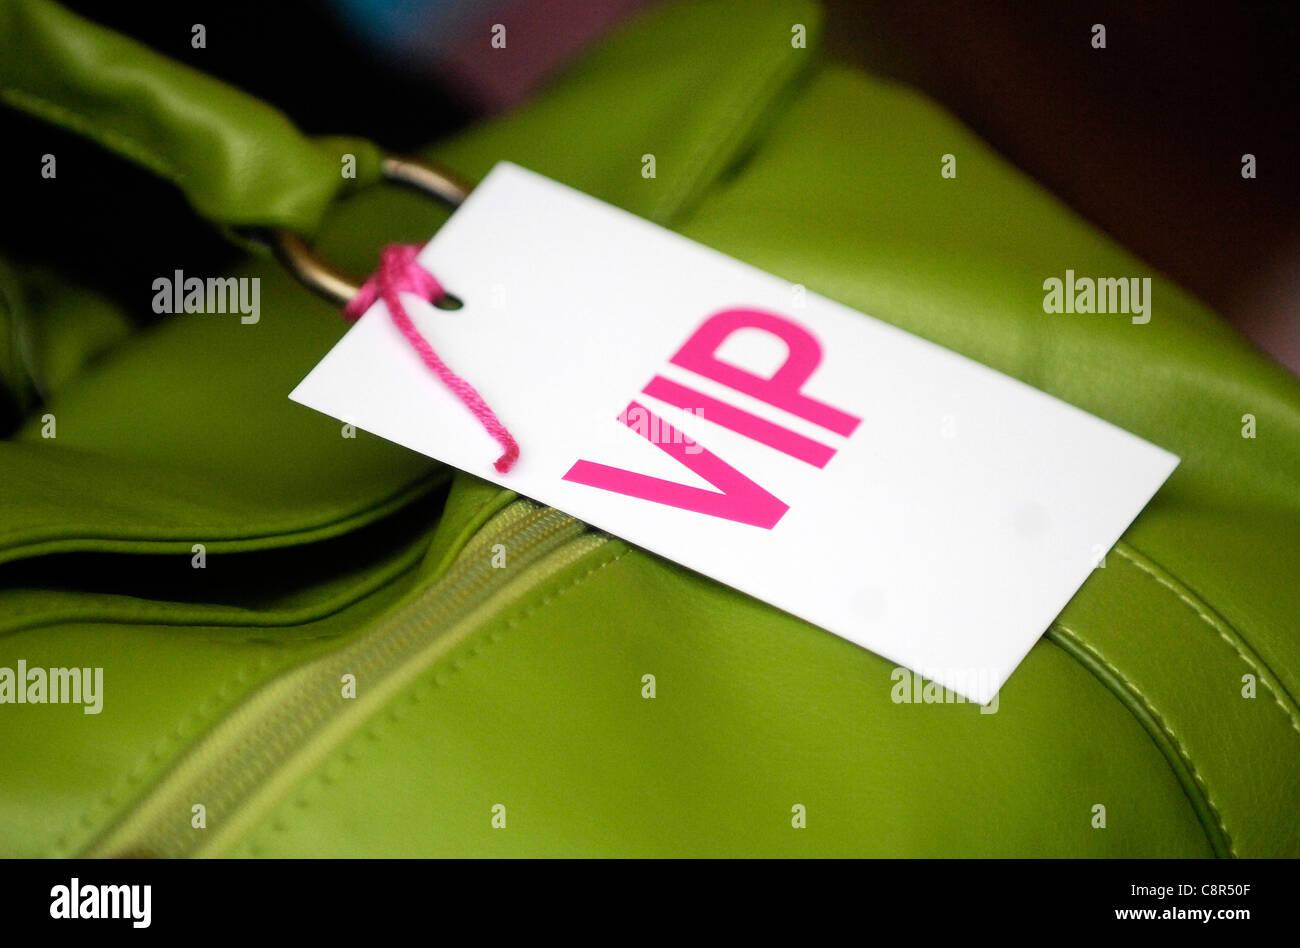 VIP pass on a woman's handbag at an event. - Stock Image